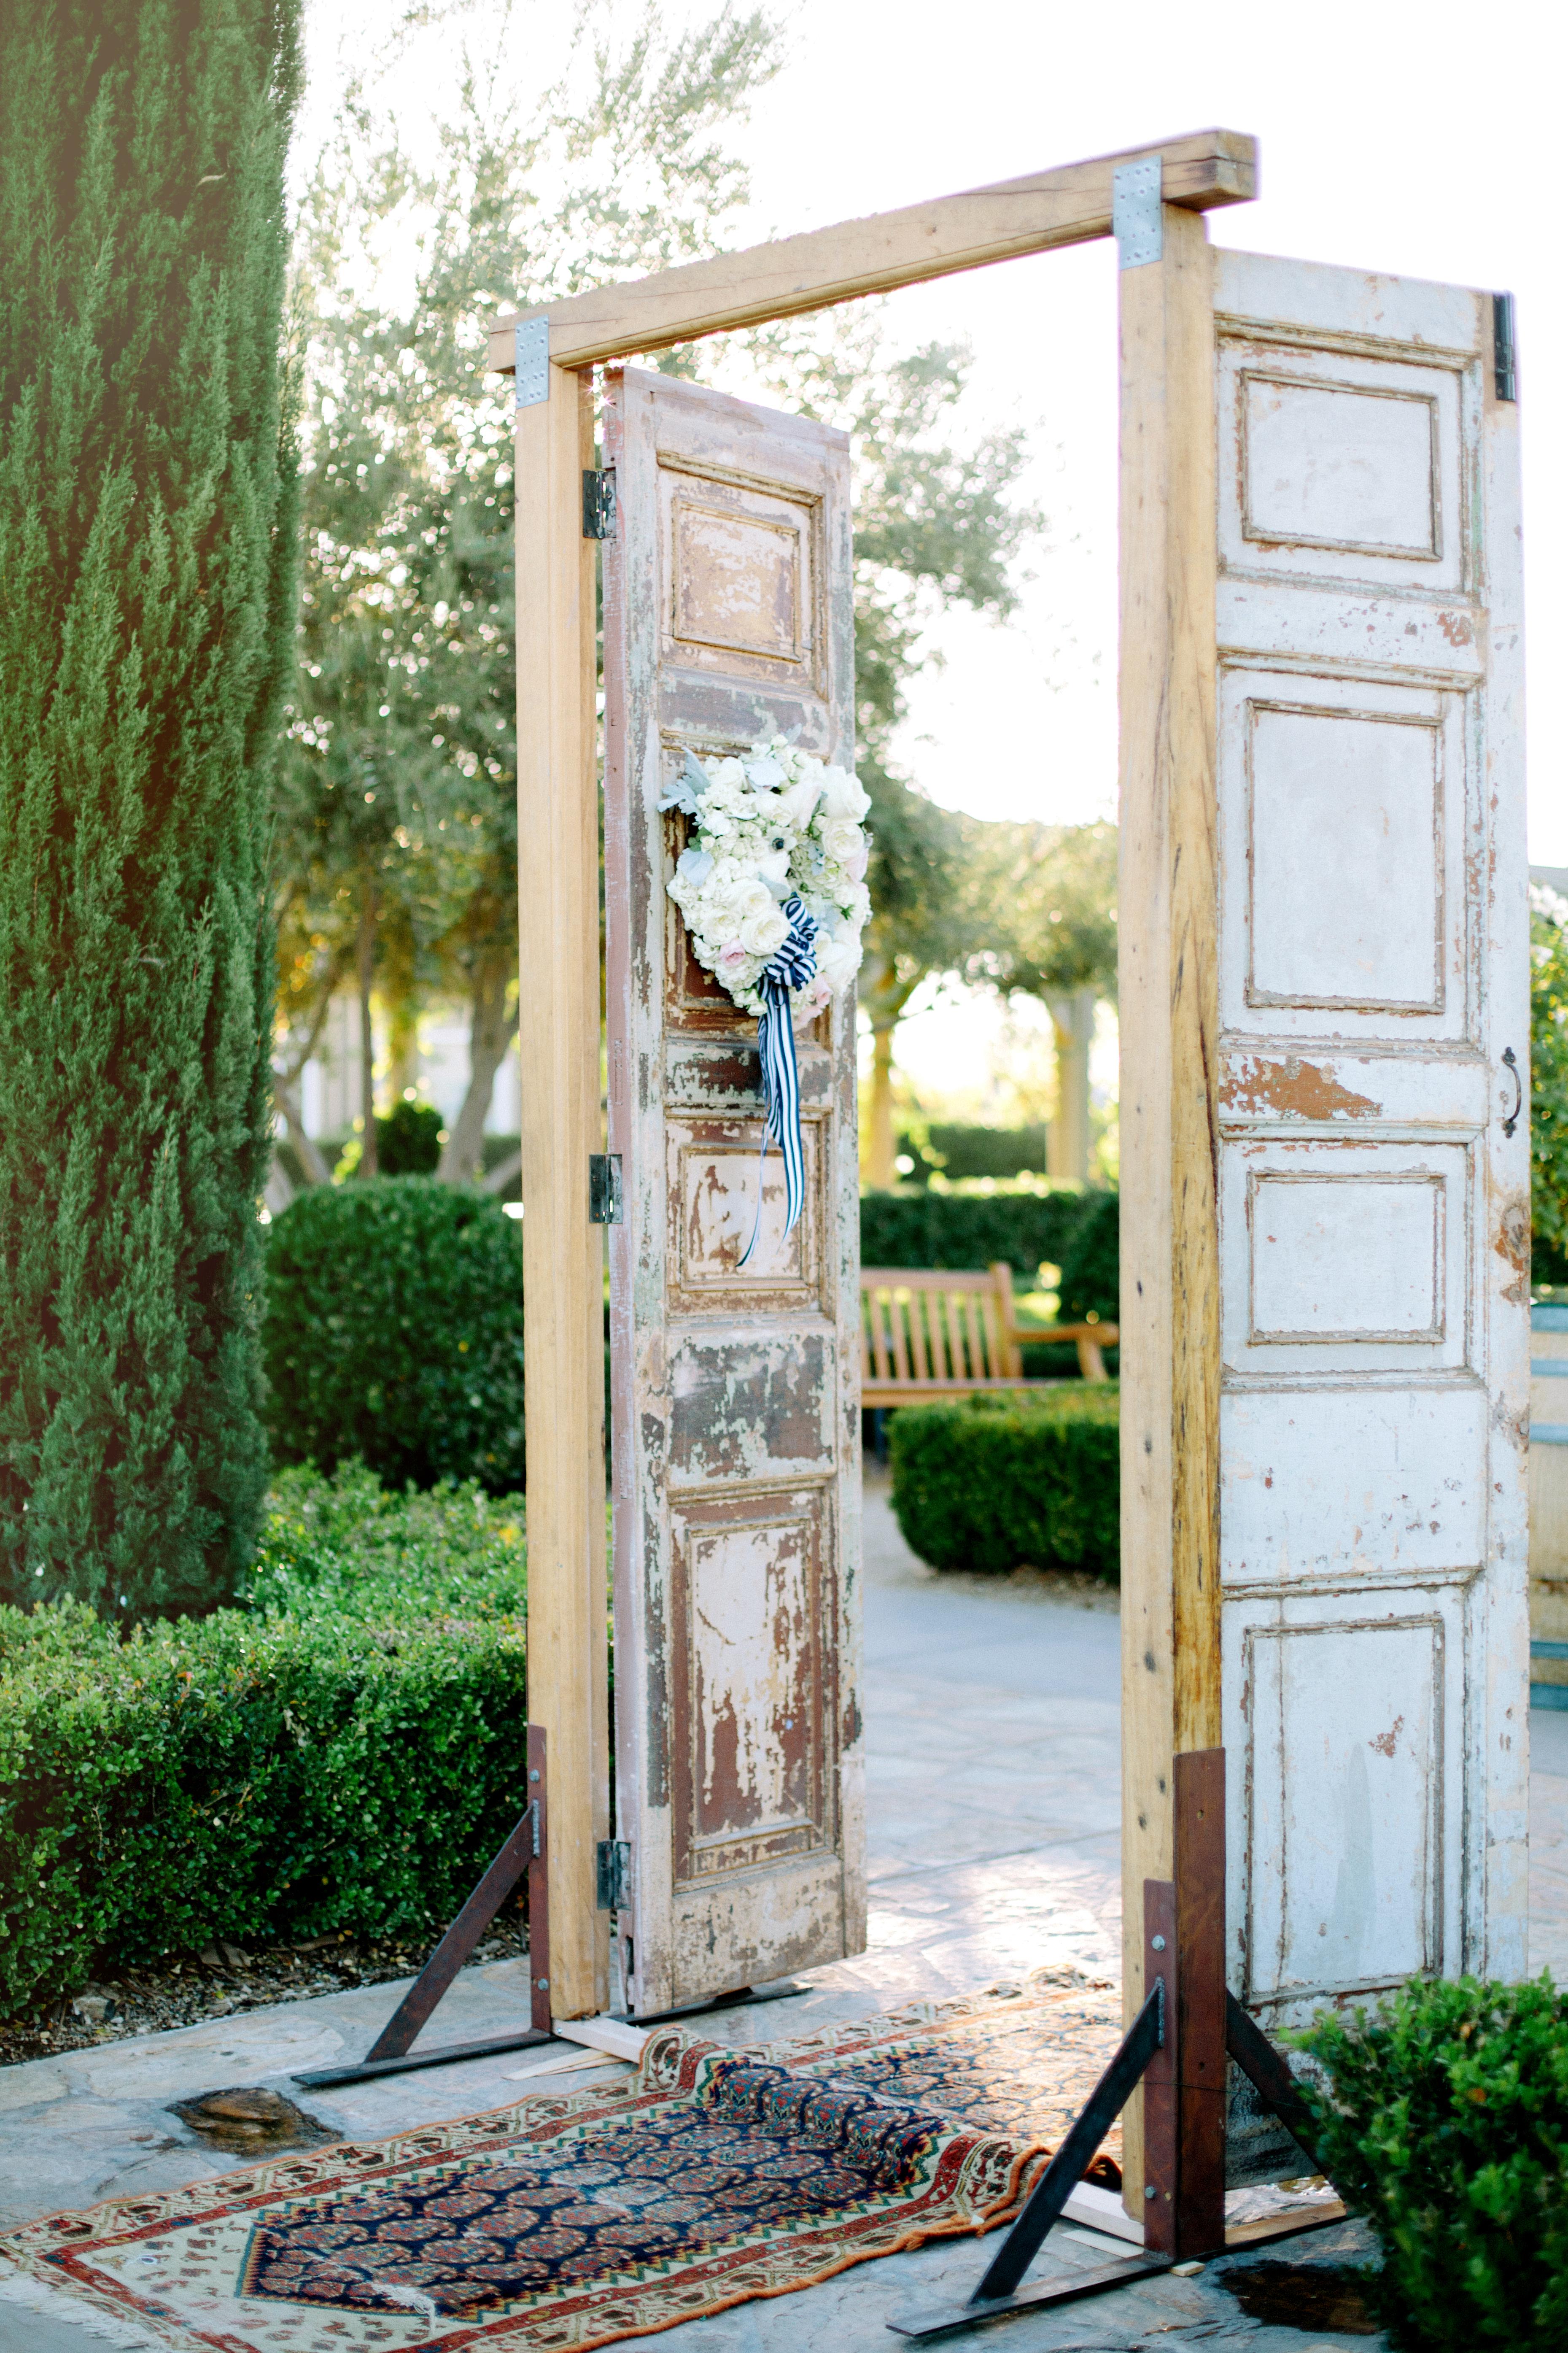 & Rustic Doors at Wedding - Elizabeth Anne Designs: The Wedding Blog